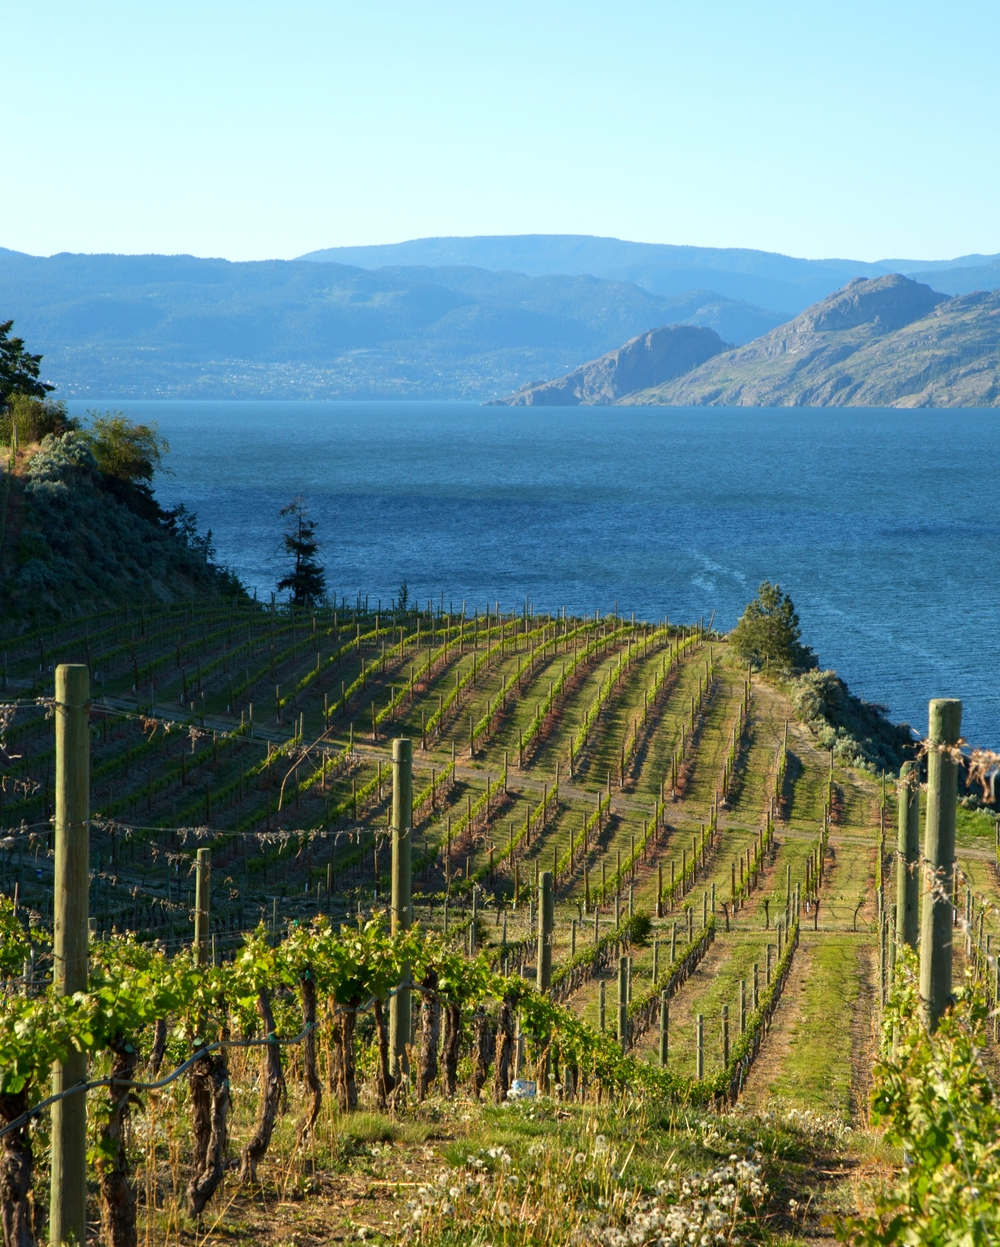 Gorgeous views: Evolve's Summerland vineyard swoops down towards Okanagan Lake (photo courtesy Evolve Cellars)